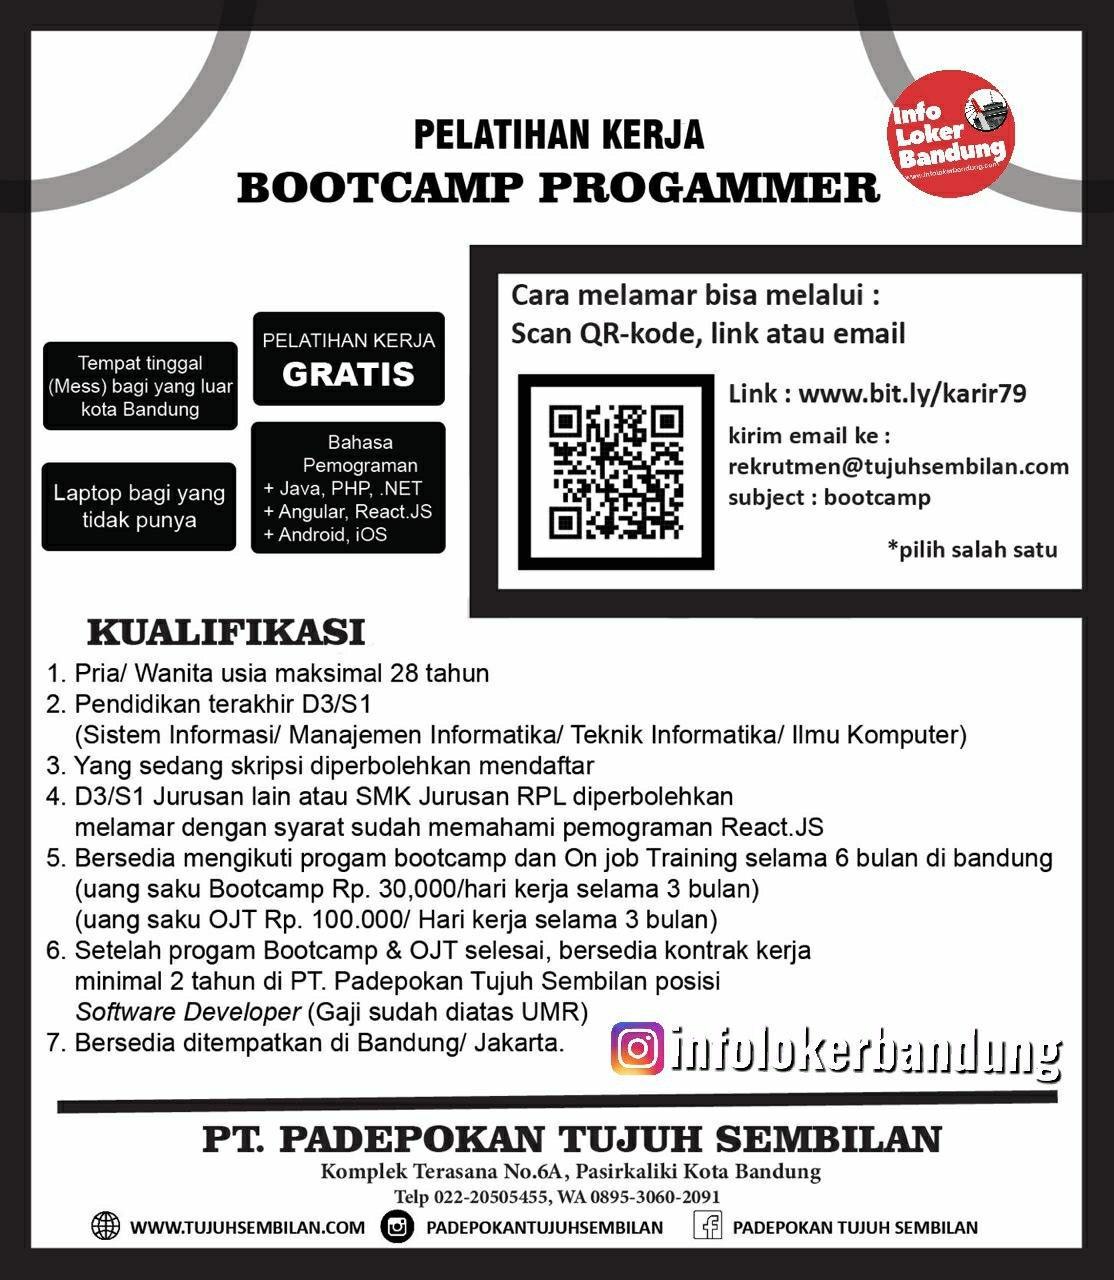 Lowongan Kerja PT. Padepokan Tujuh Sembilan Bandung Maret 2020